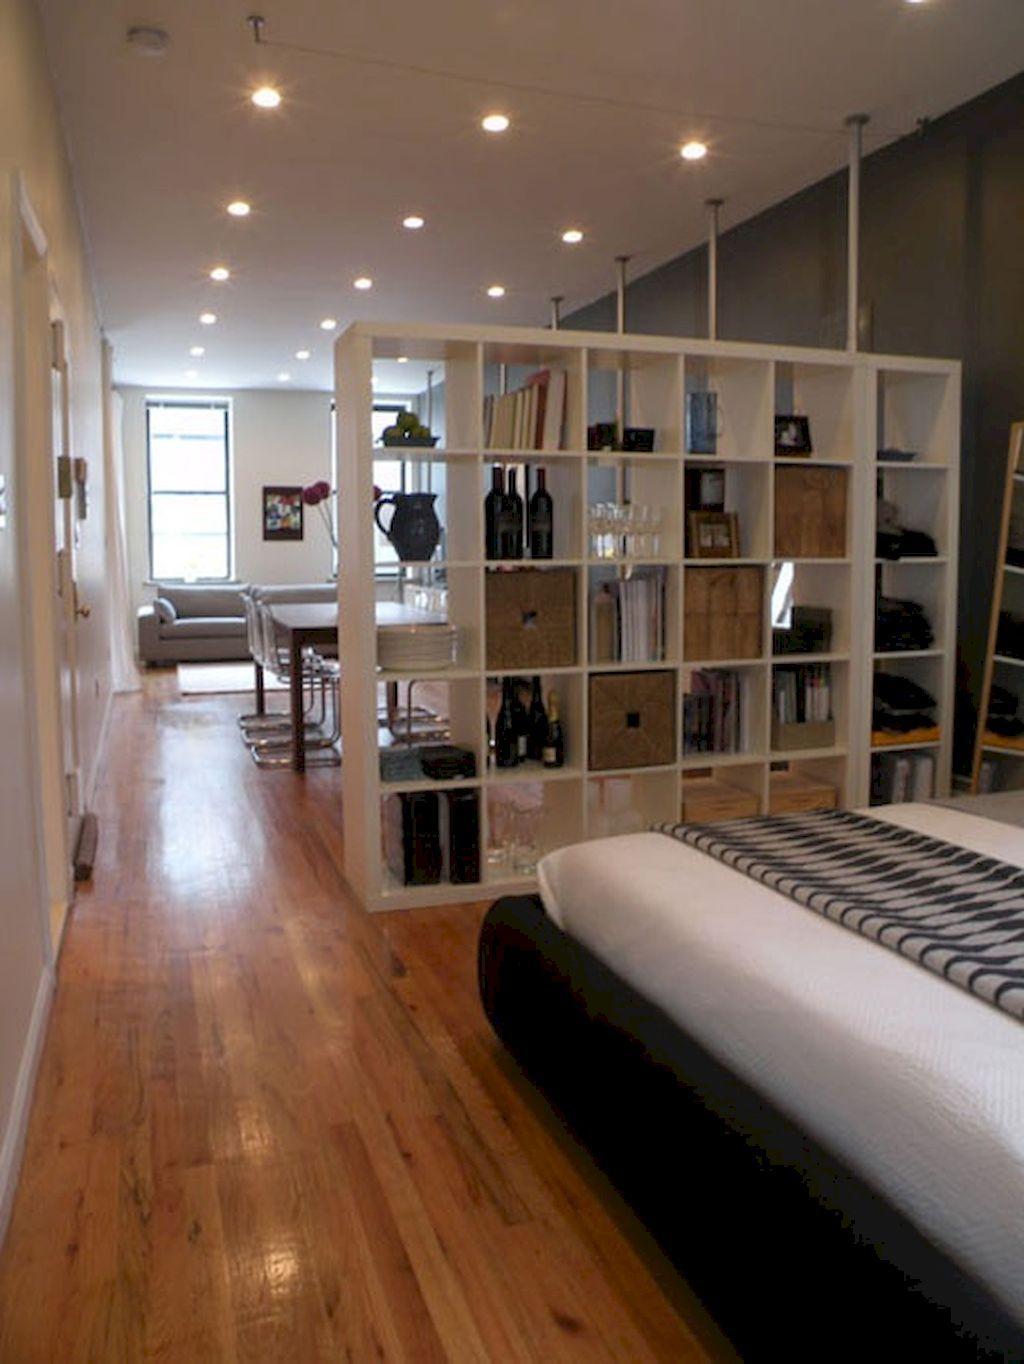 Cool stylish and cute apartment studio decor ideas